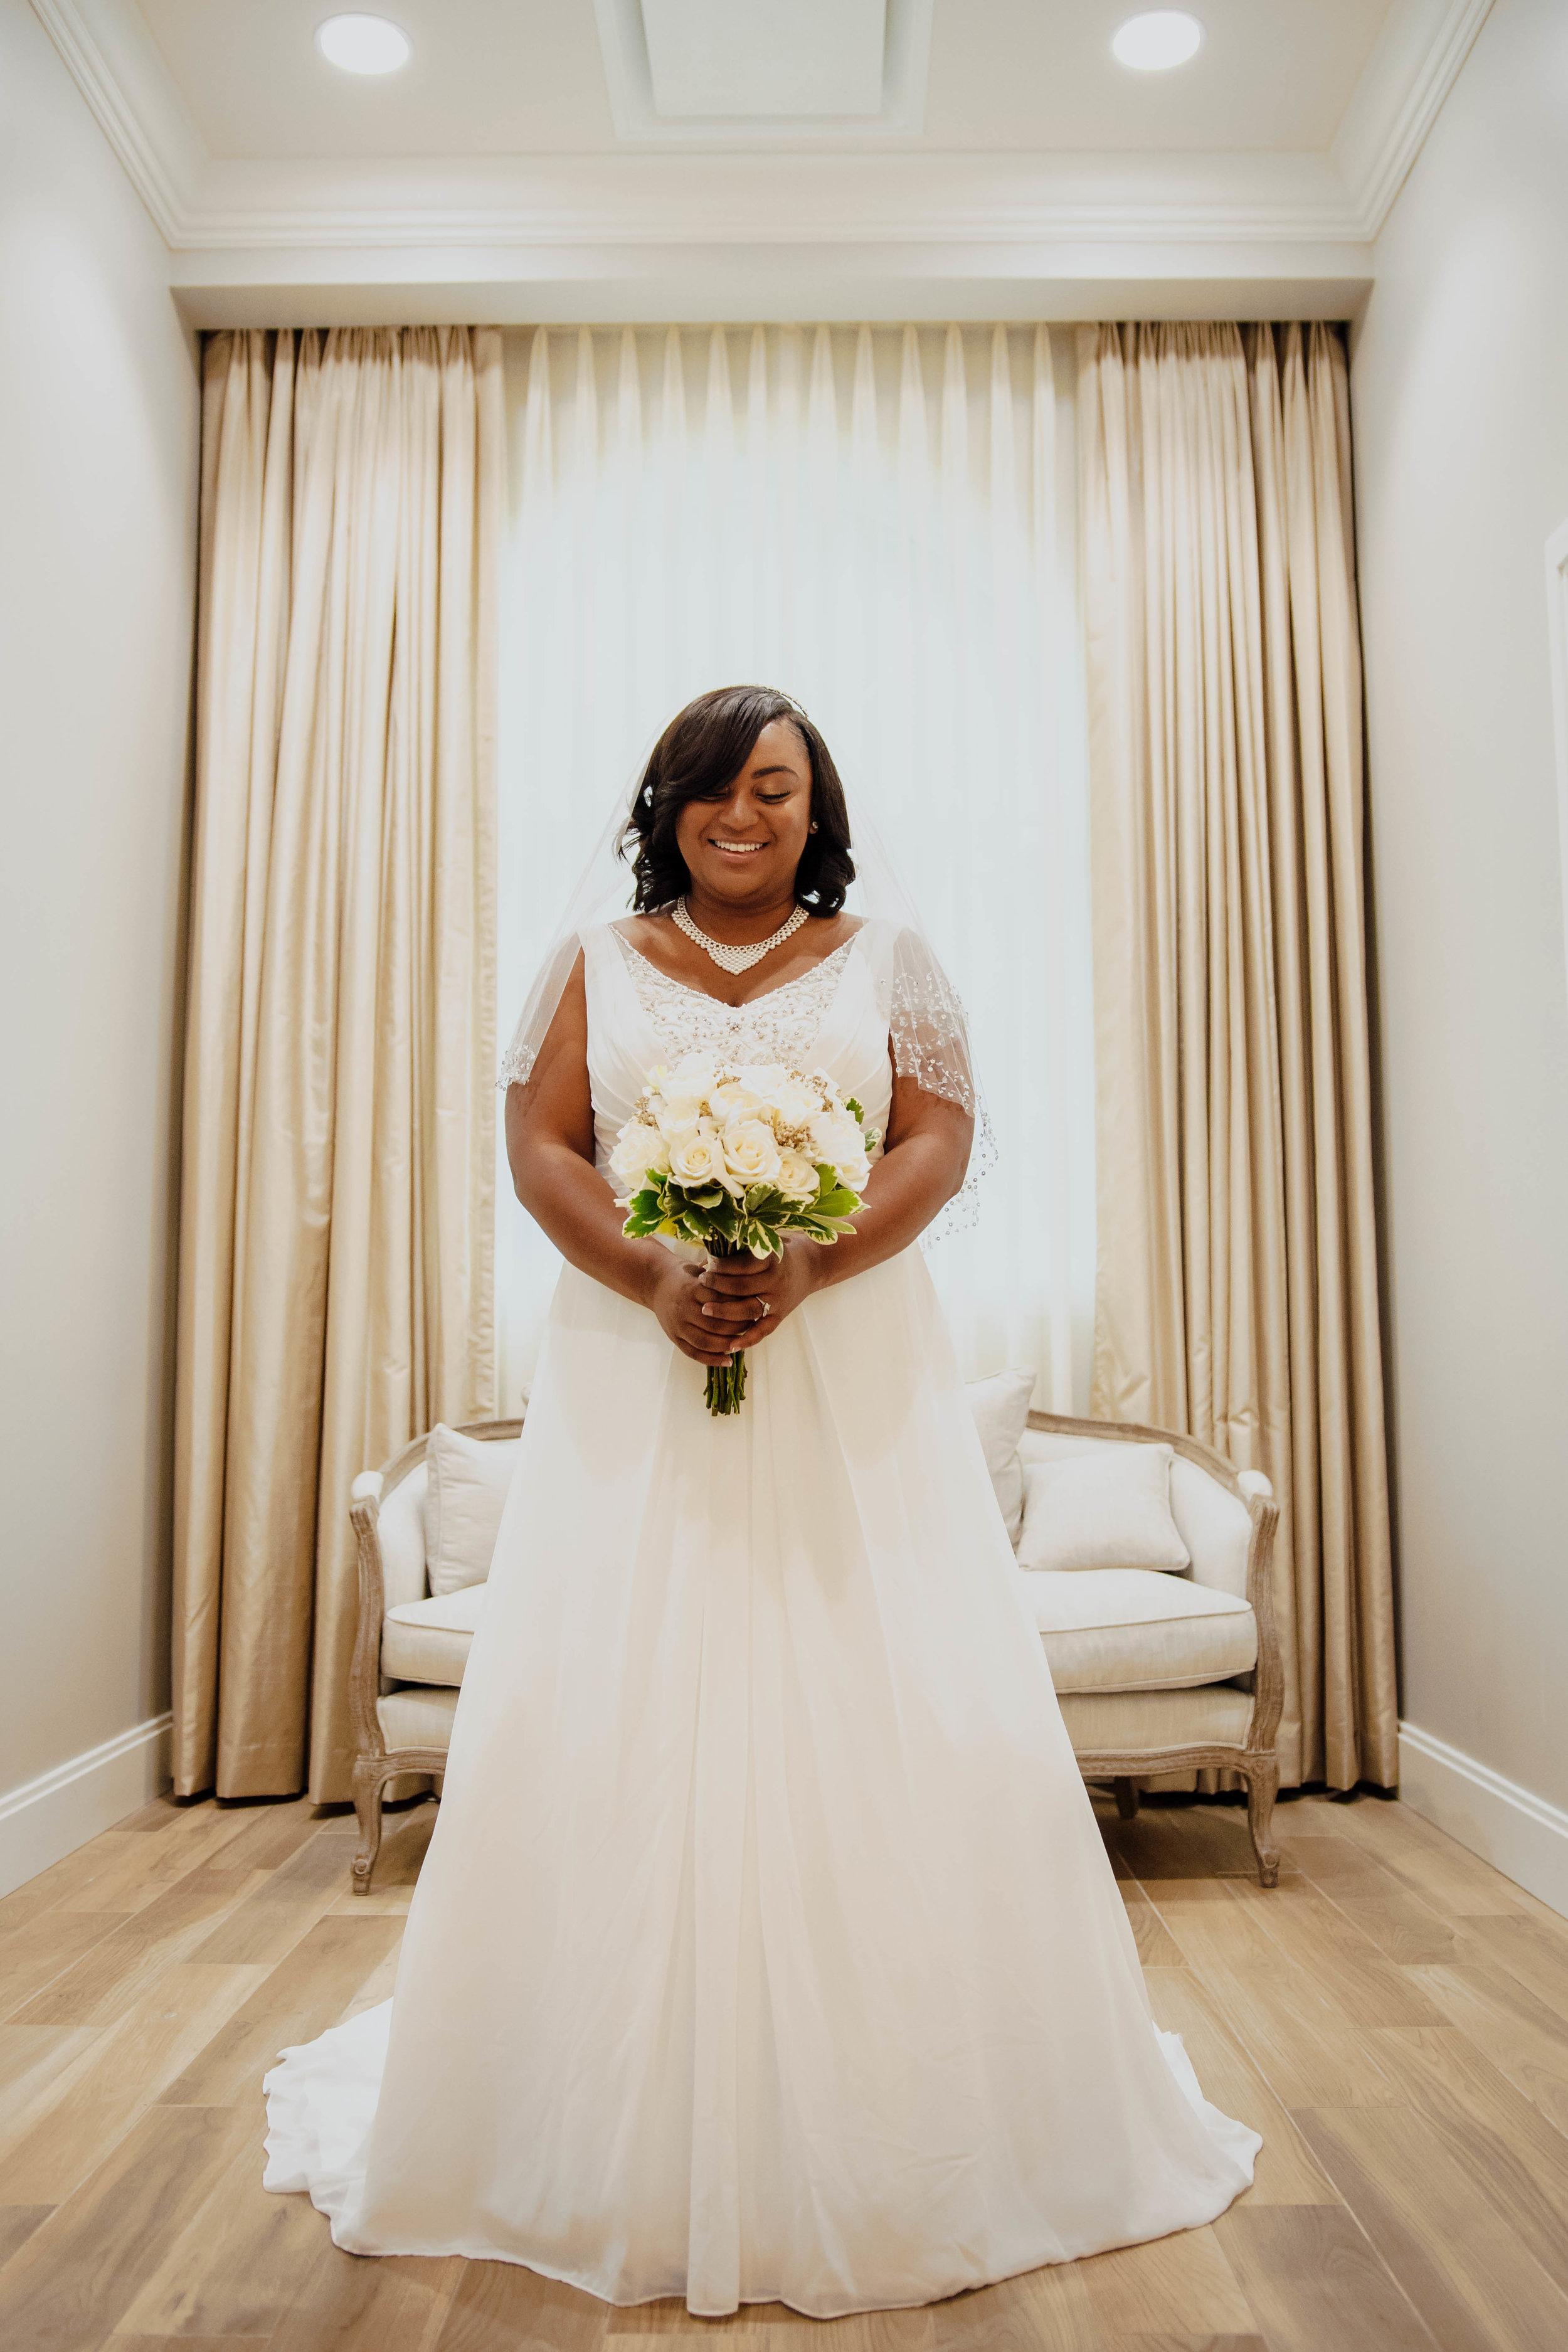 McNeile_Photography_Wedding_Tampa23.jpg